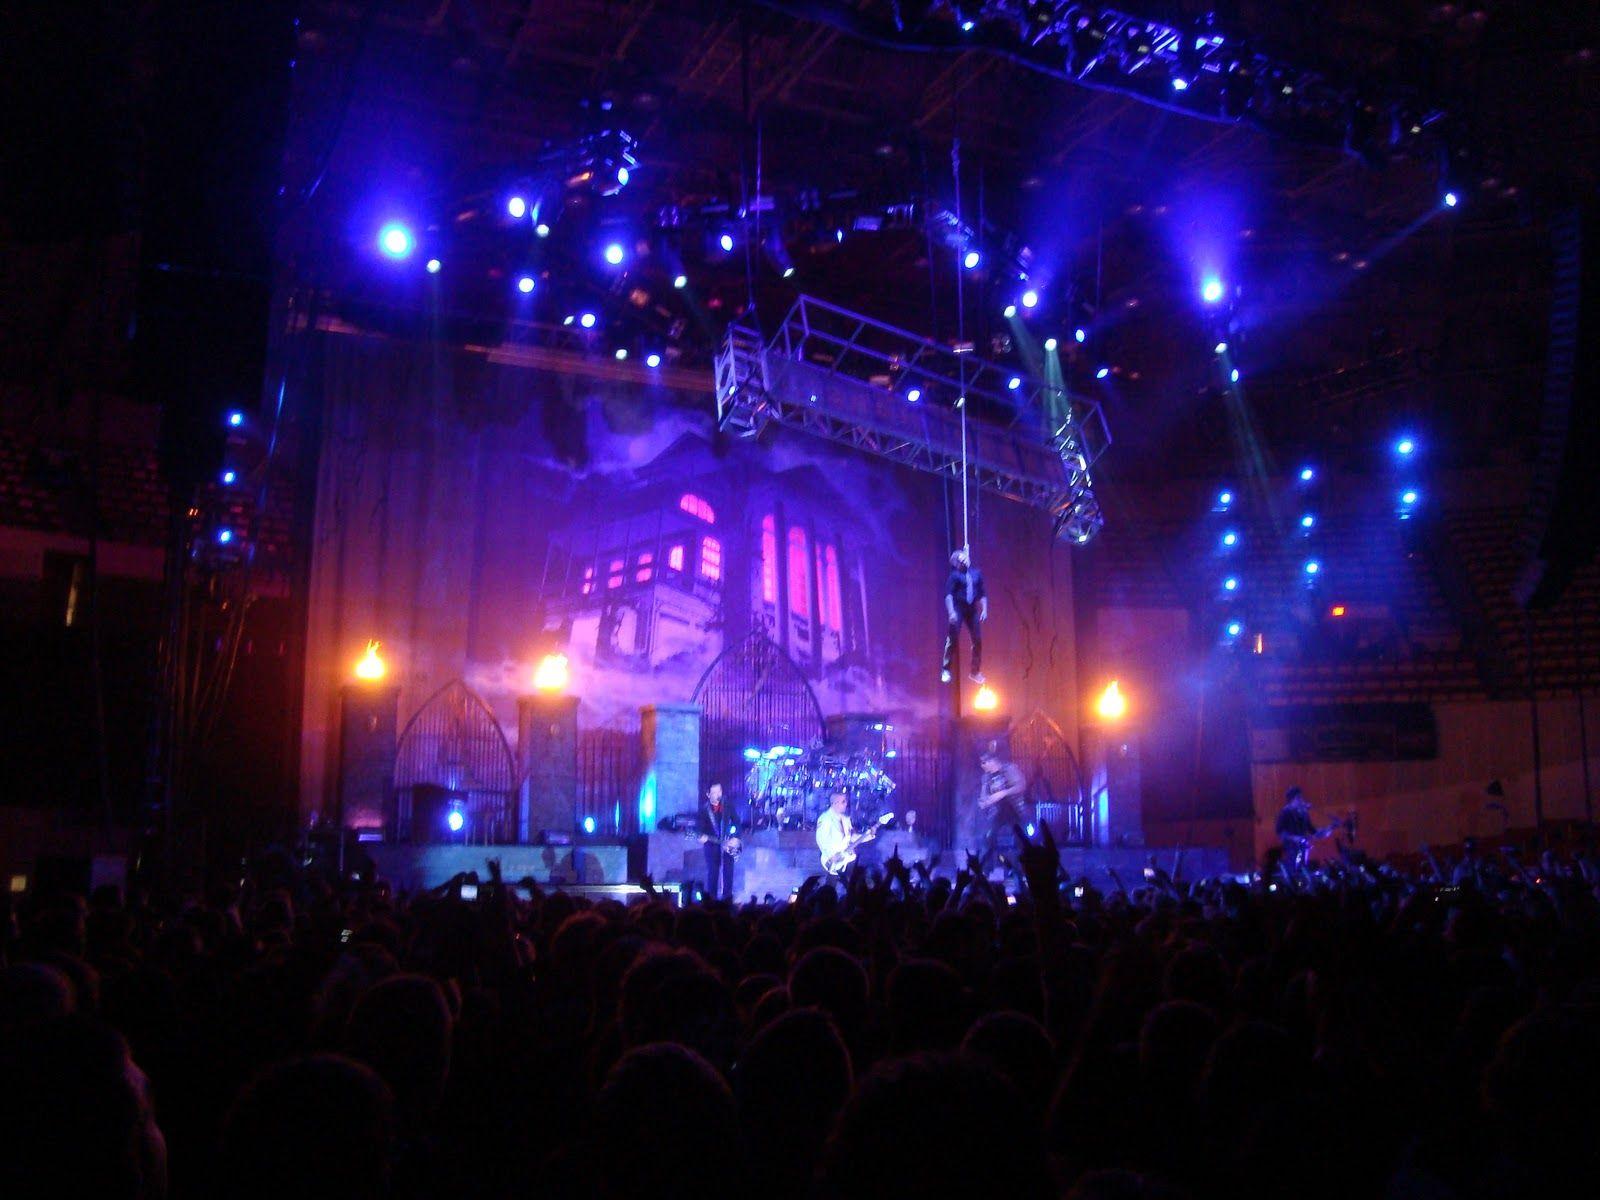 Avenged Sevenfold A7x Music Pinterest Avenged Sevenfold And